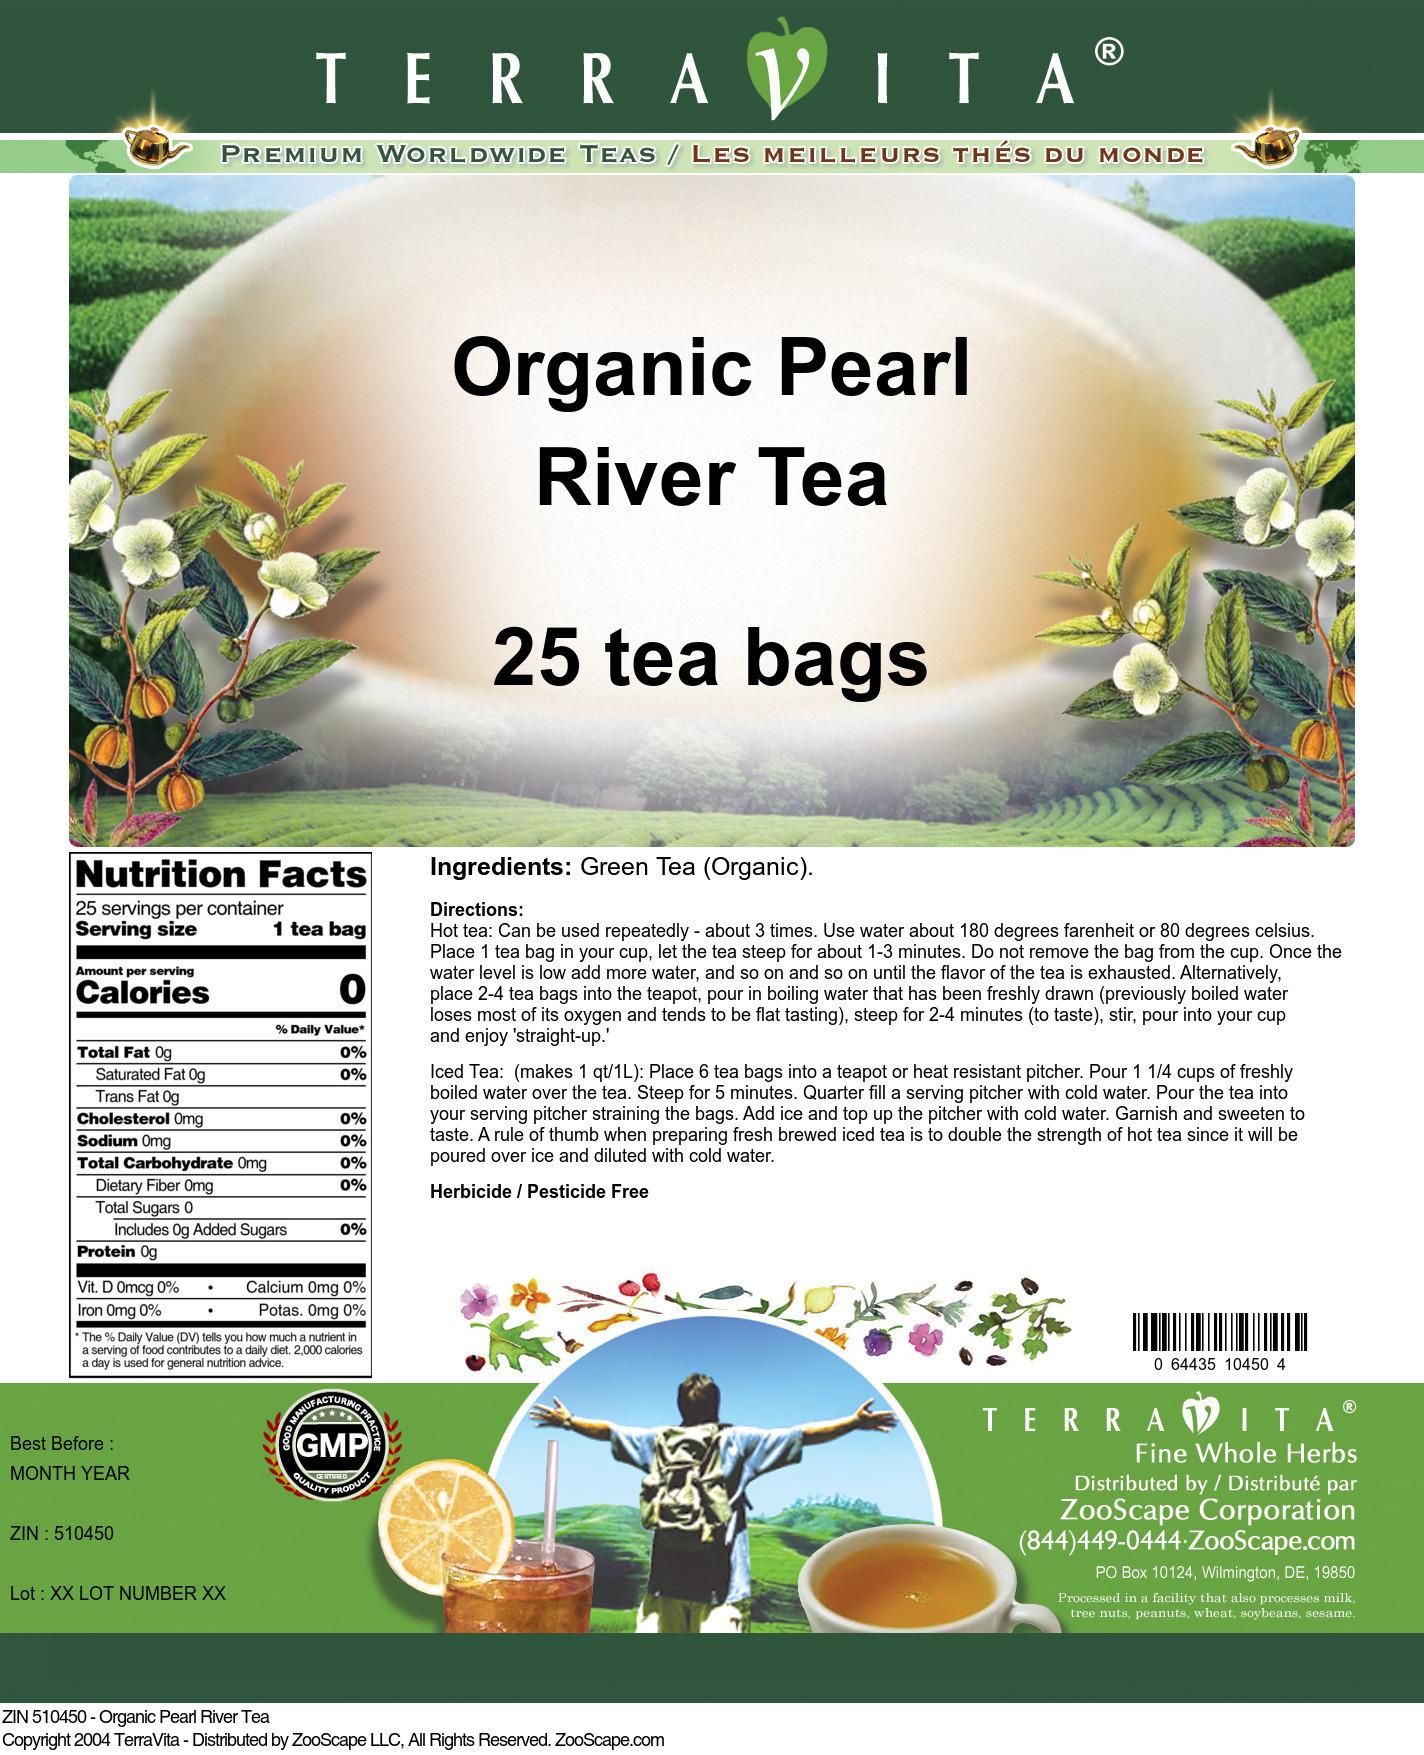 Organic Pearl River Tea